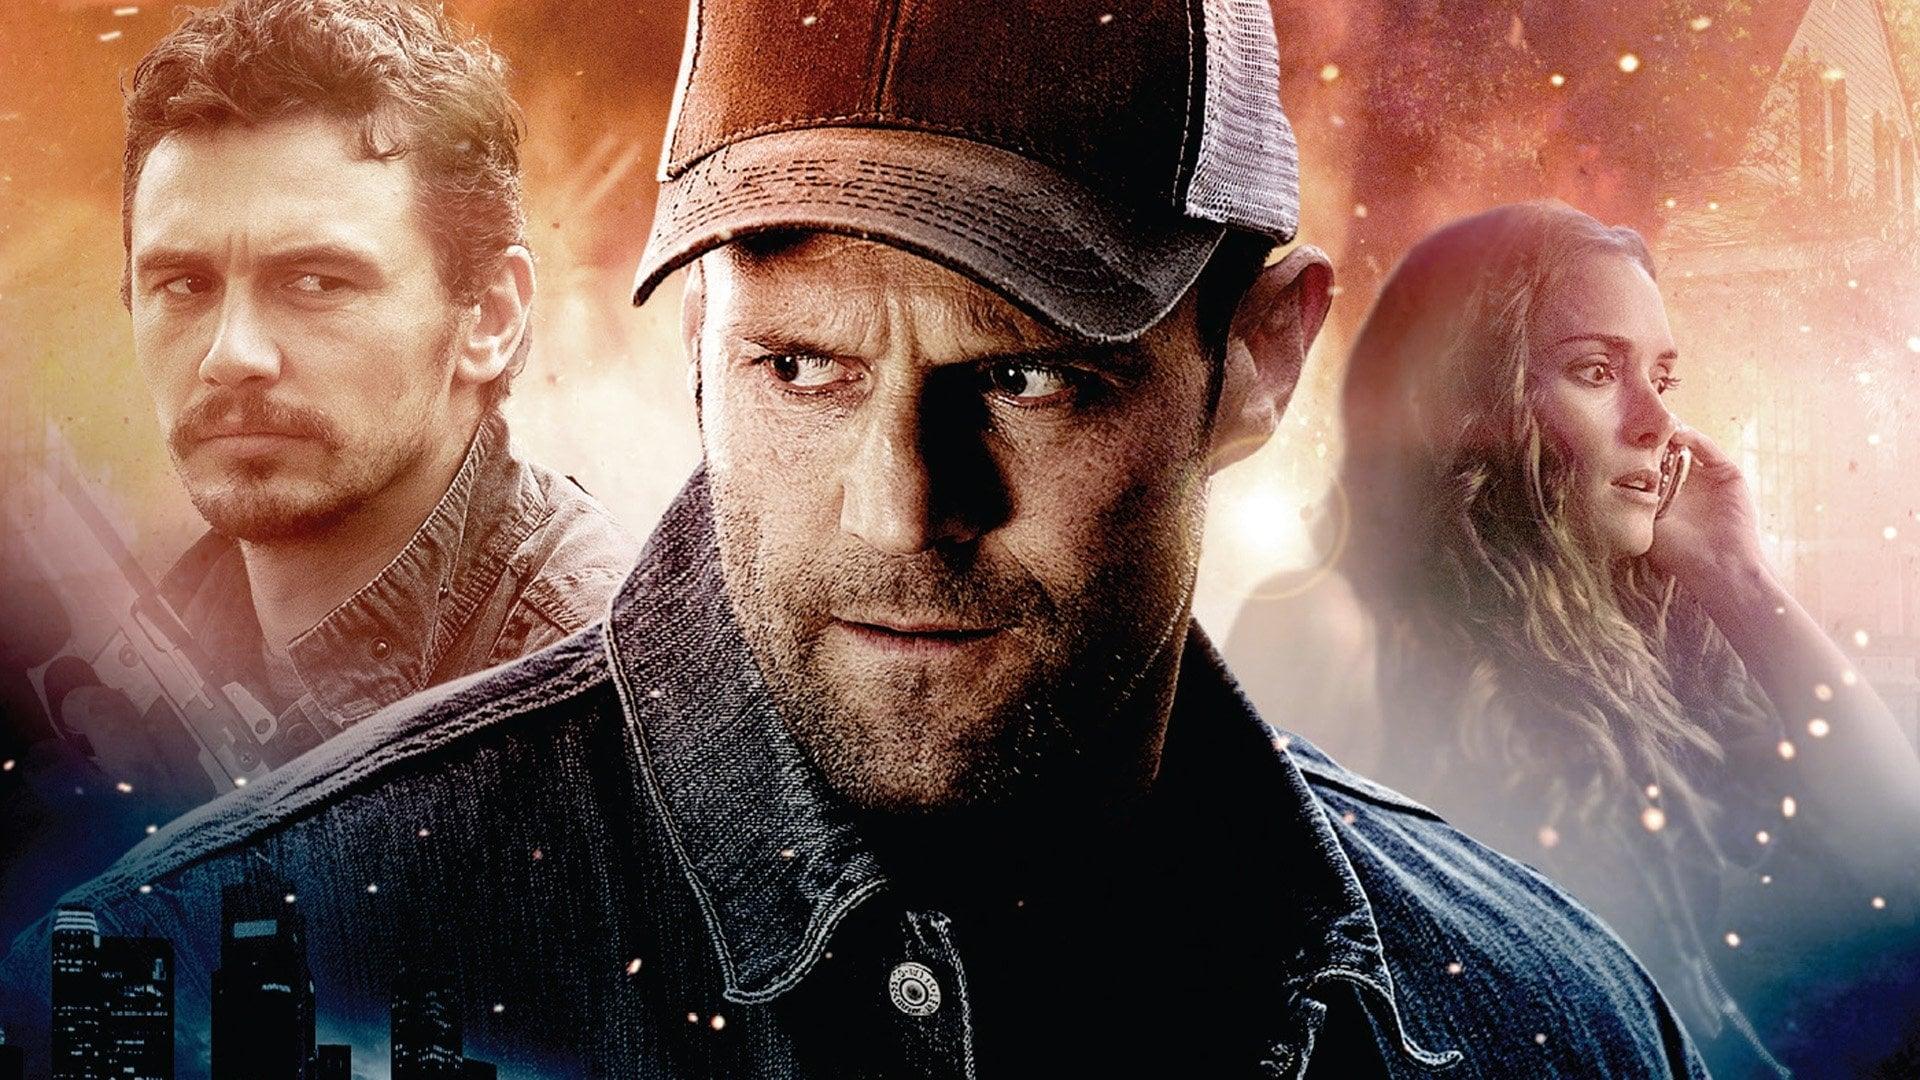 Movie DB 9.9